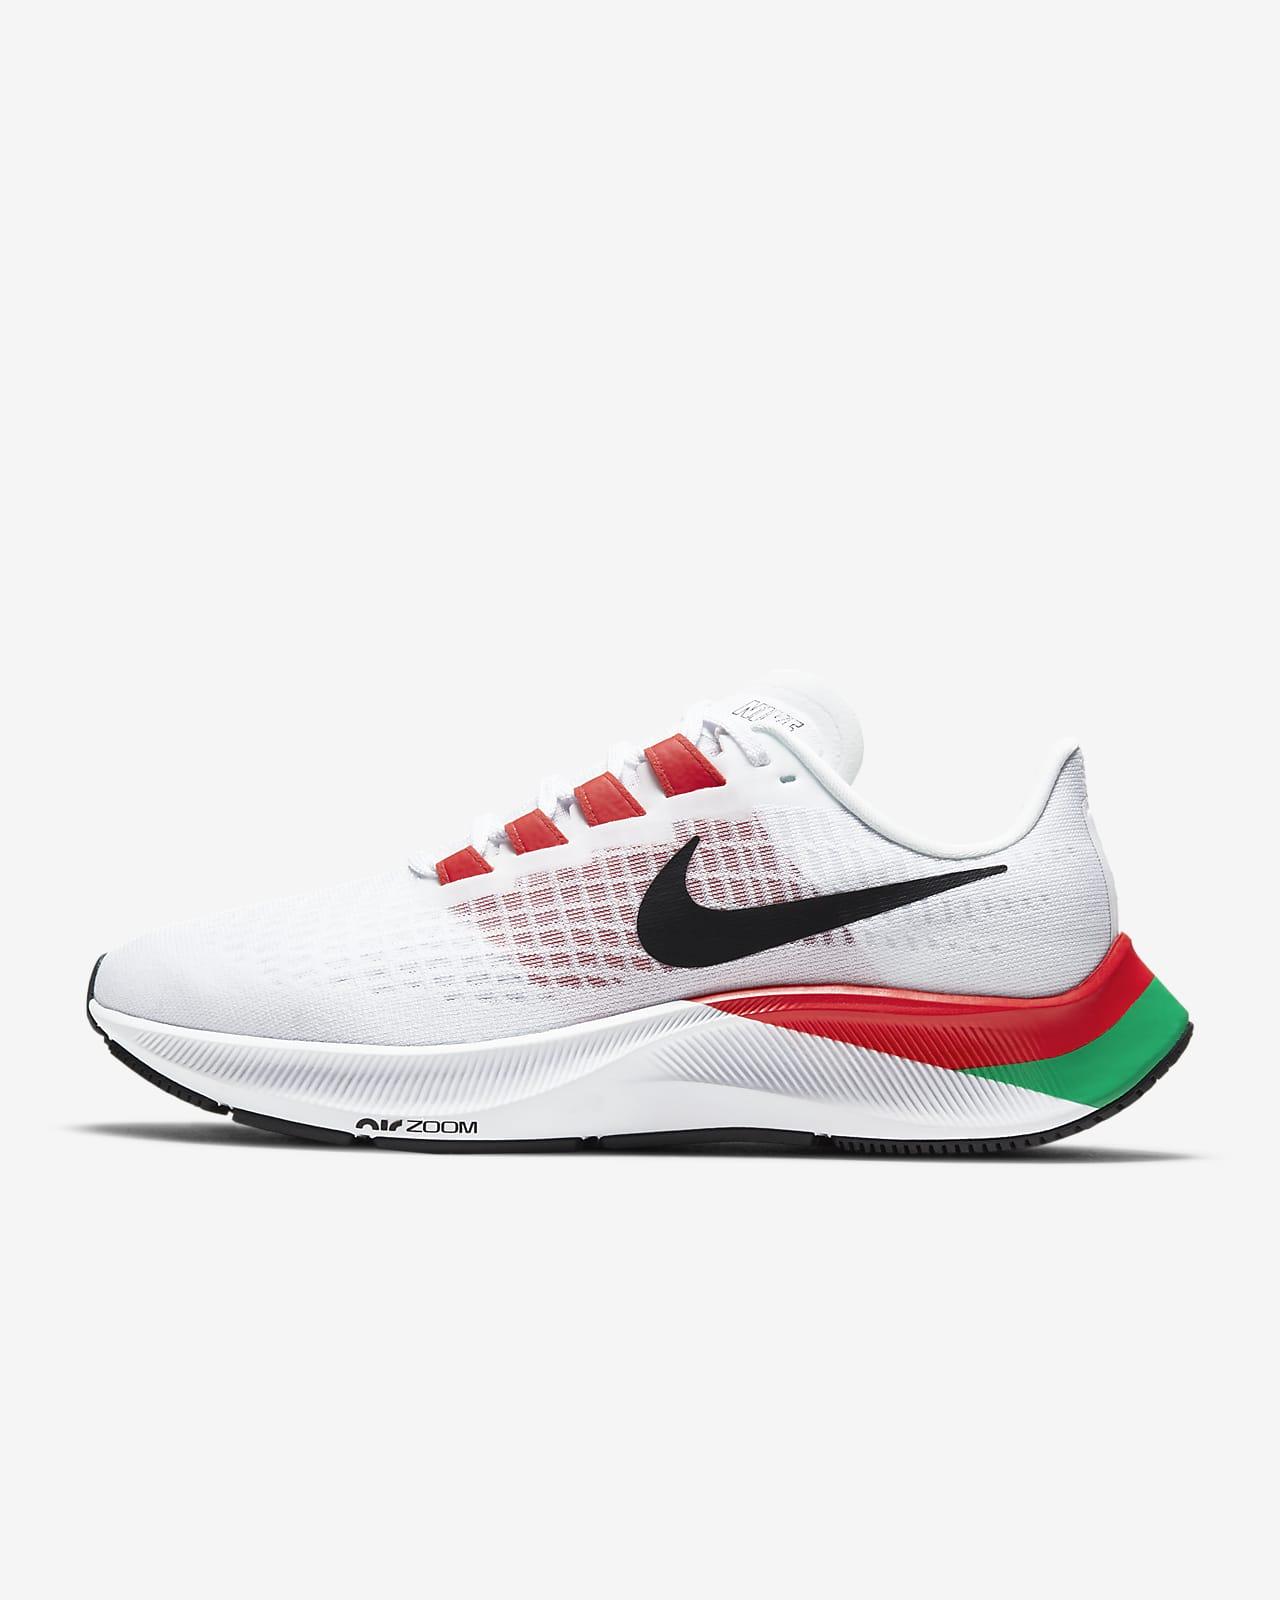 Nike Air Zoom Pegasus 37 Eliud Kipchoge Zapatillas de running - Mujer